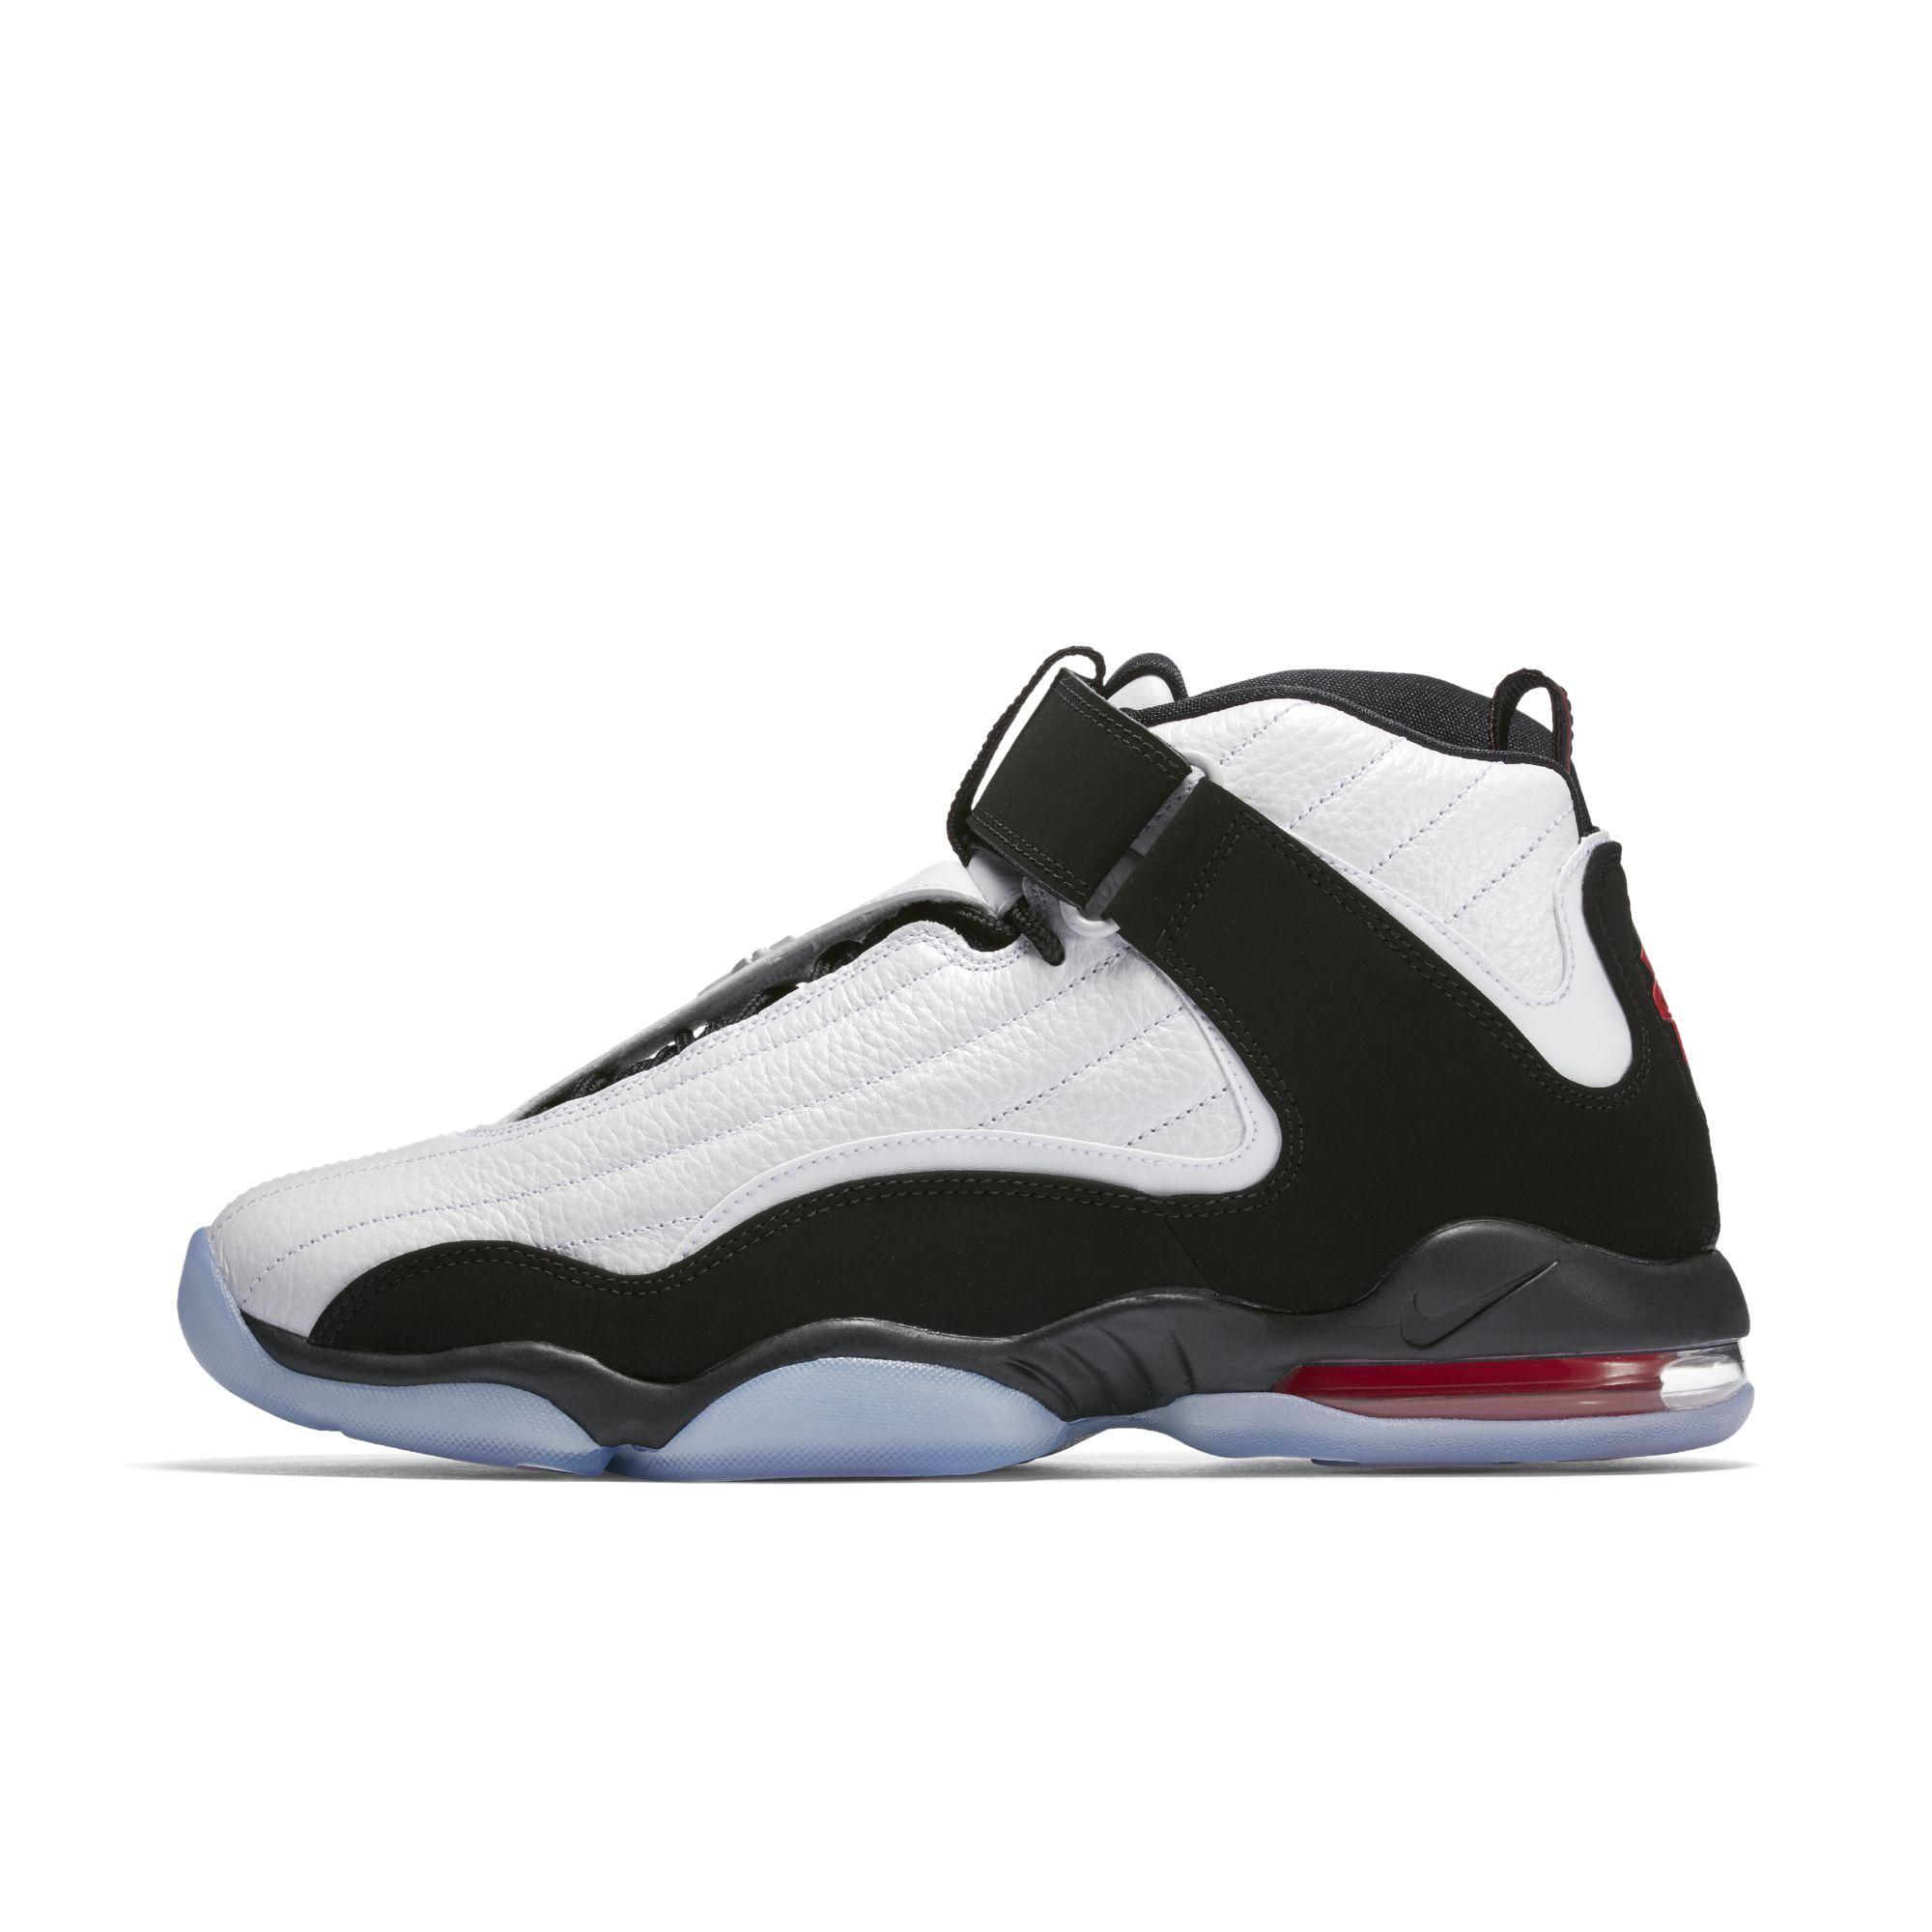 Nike-Air-Penny-4-White-Black-True-Red-1